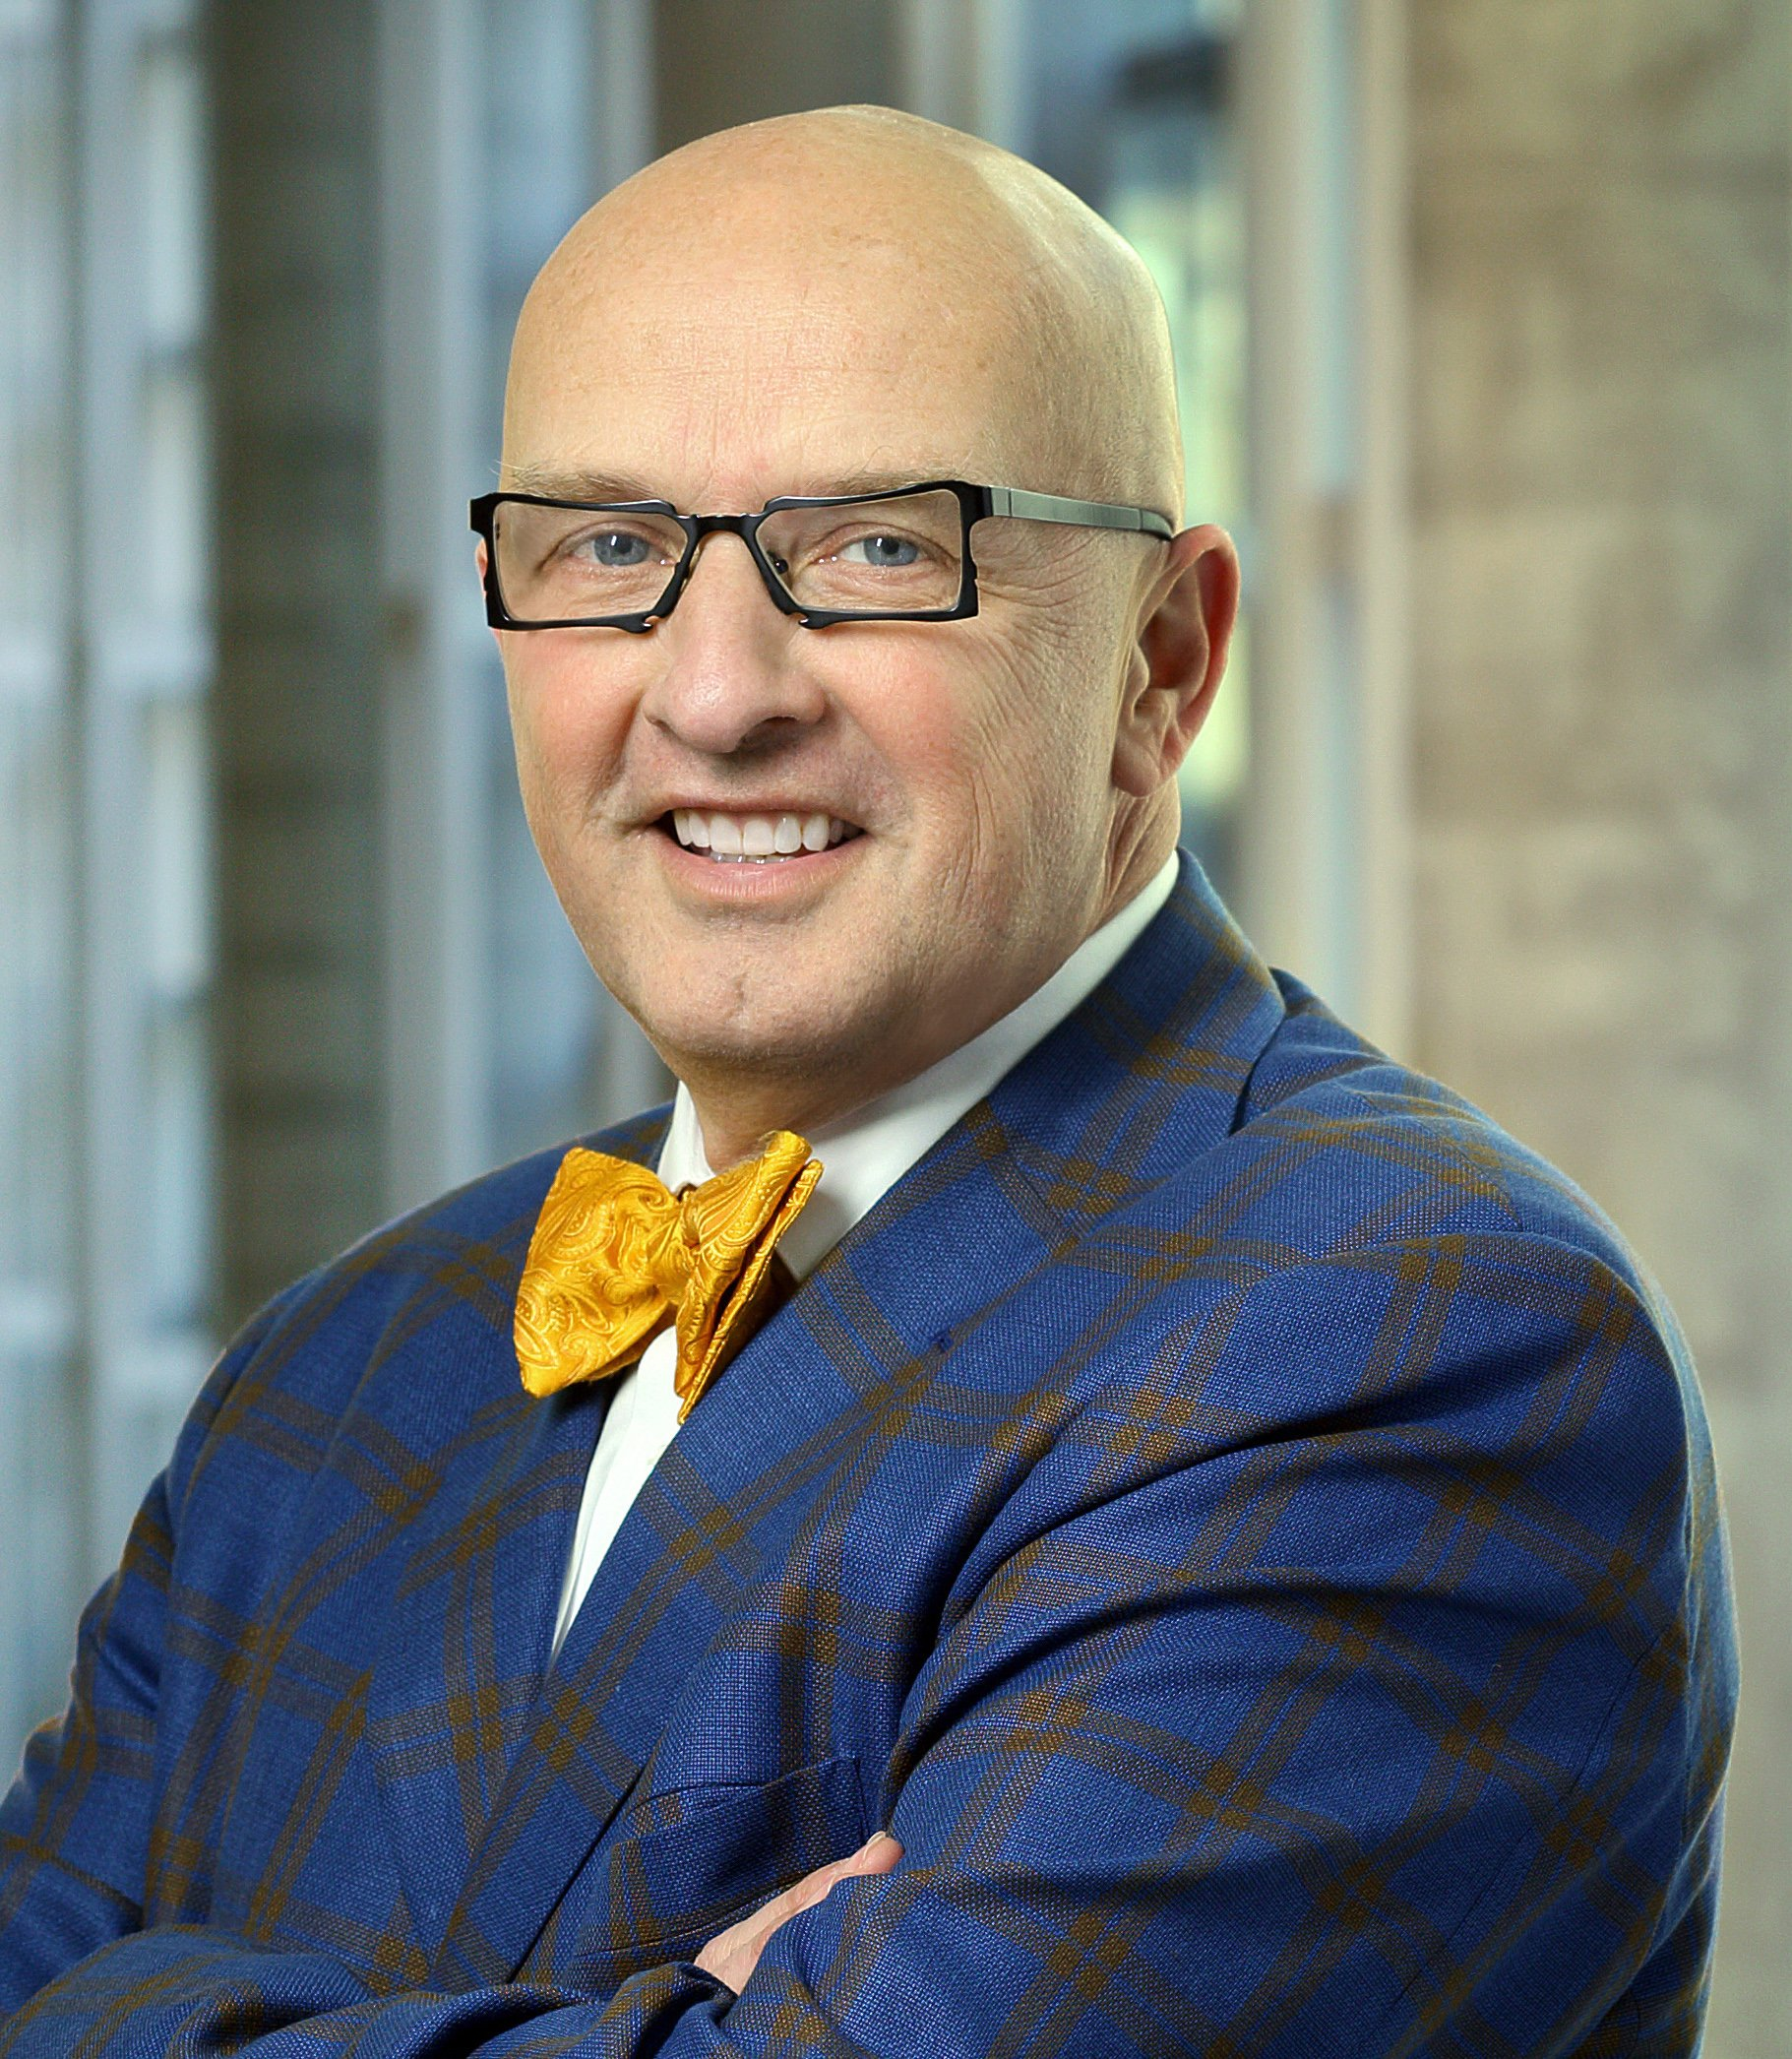 Kevin Sowers, presidente de Johns Hopkins Health System